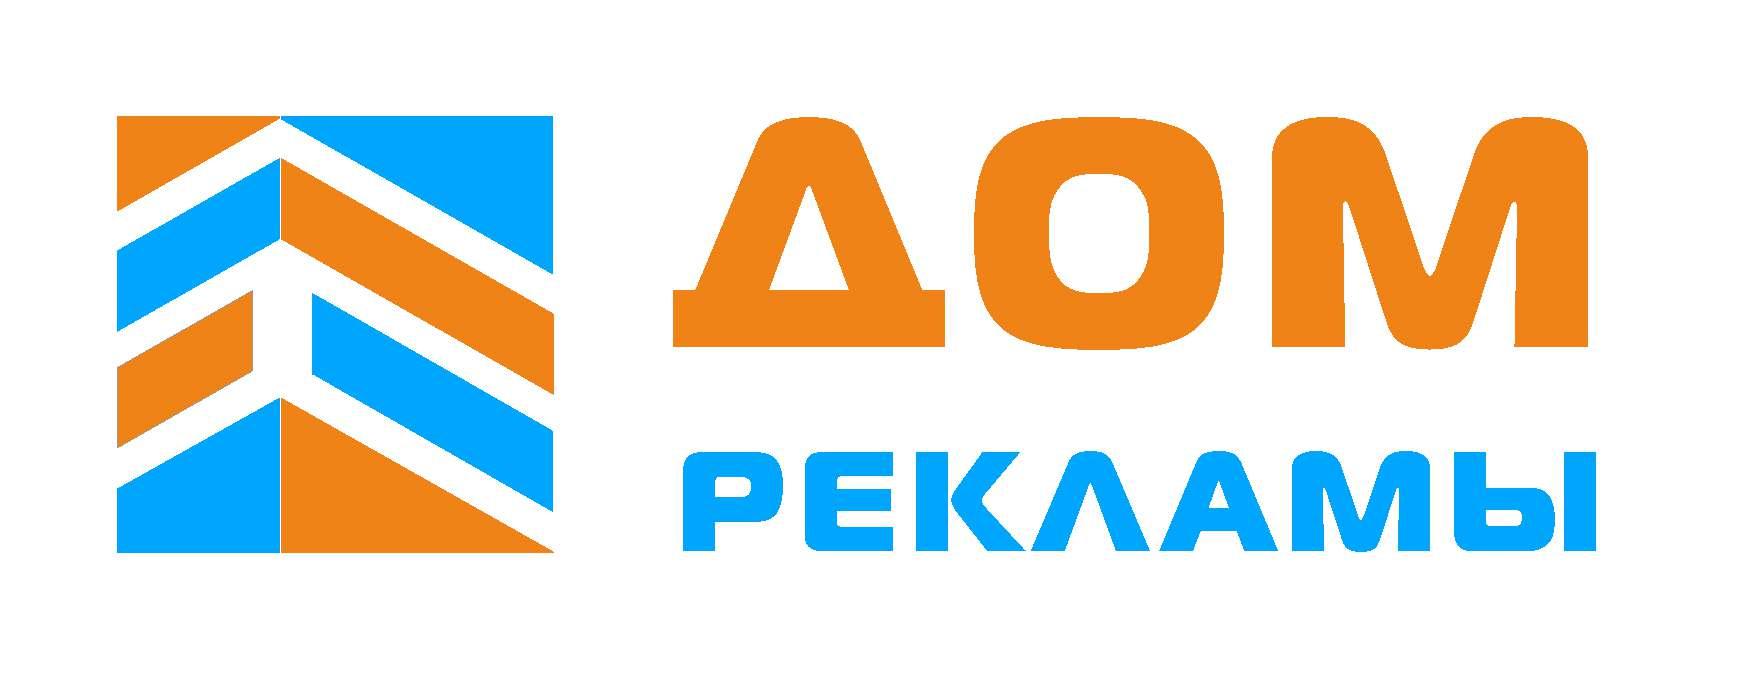 Дизайн логотипа рекламно-производственной компании фото f_0505edabc075b94c.jpg